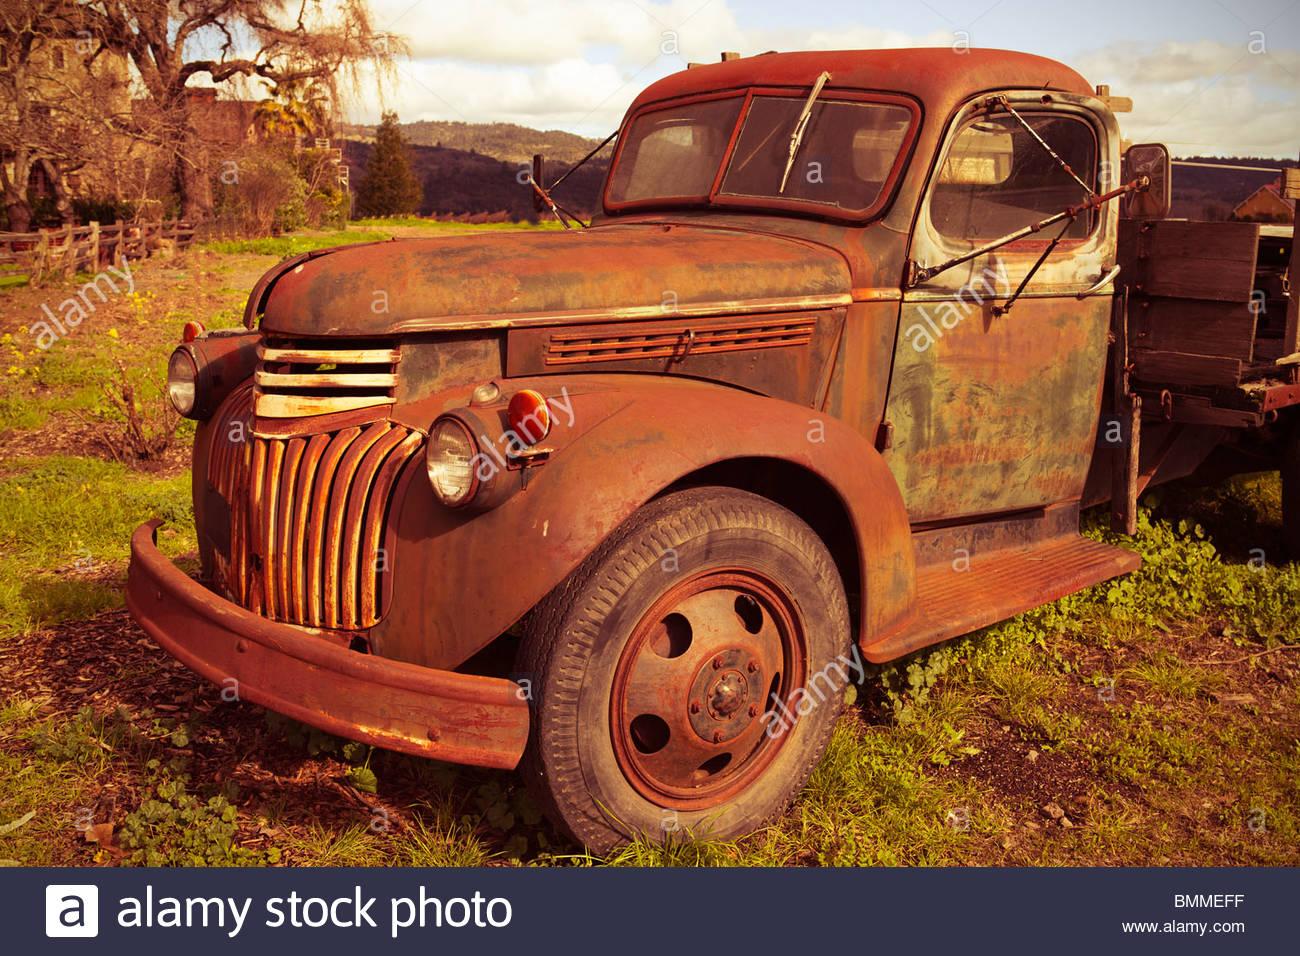 Cross processed rusty truck - Stock Image